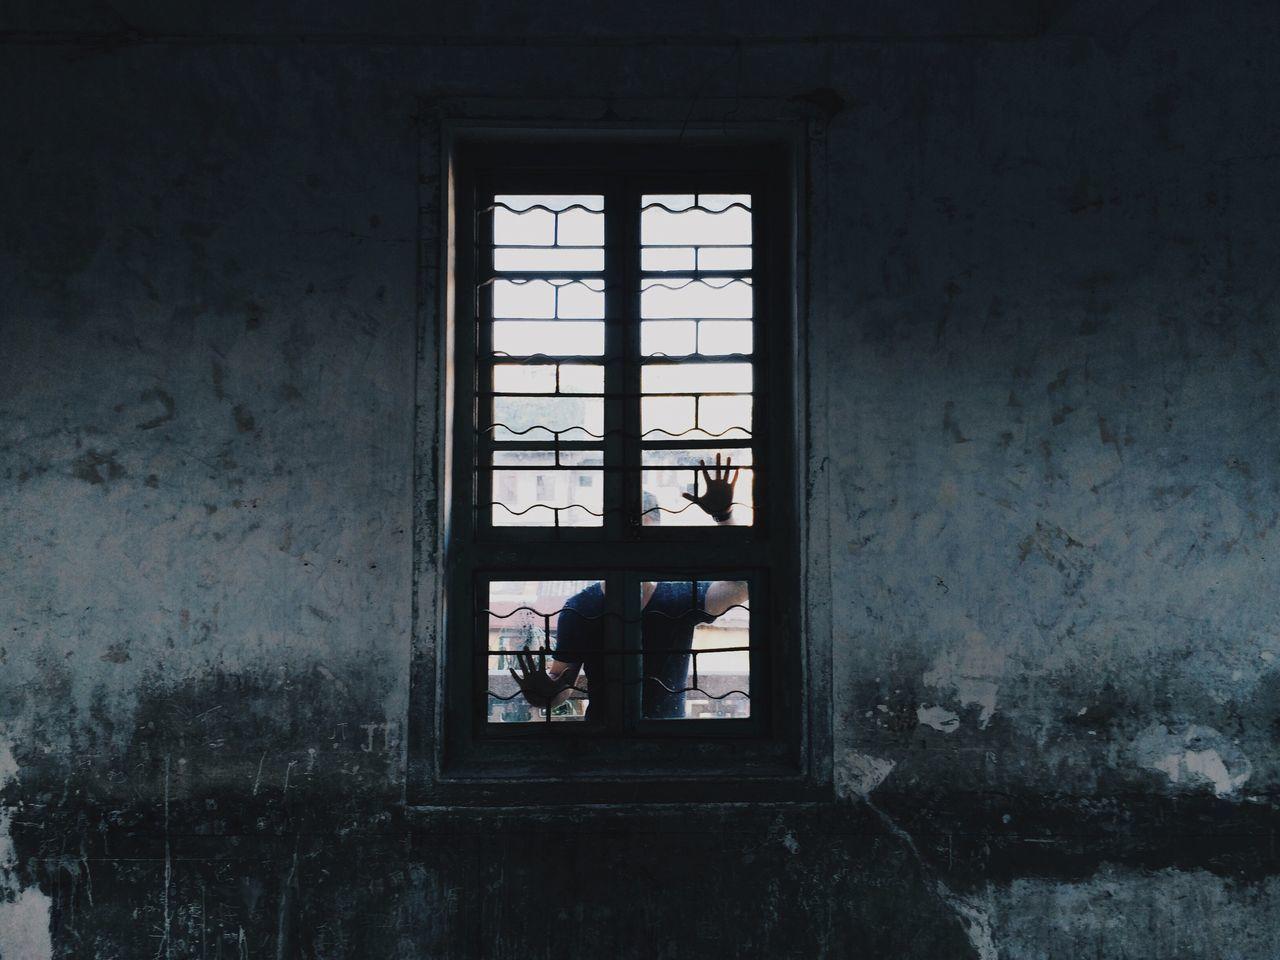 Man standing behind closed window